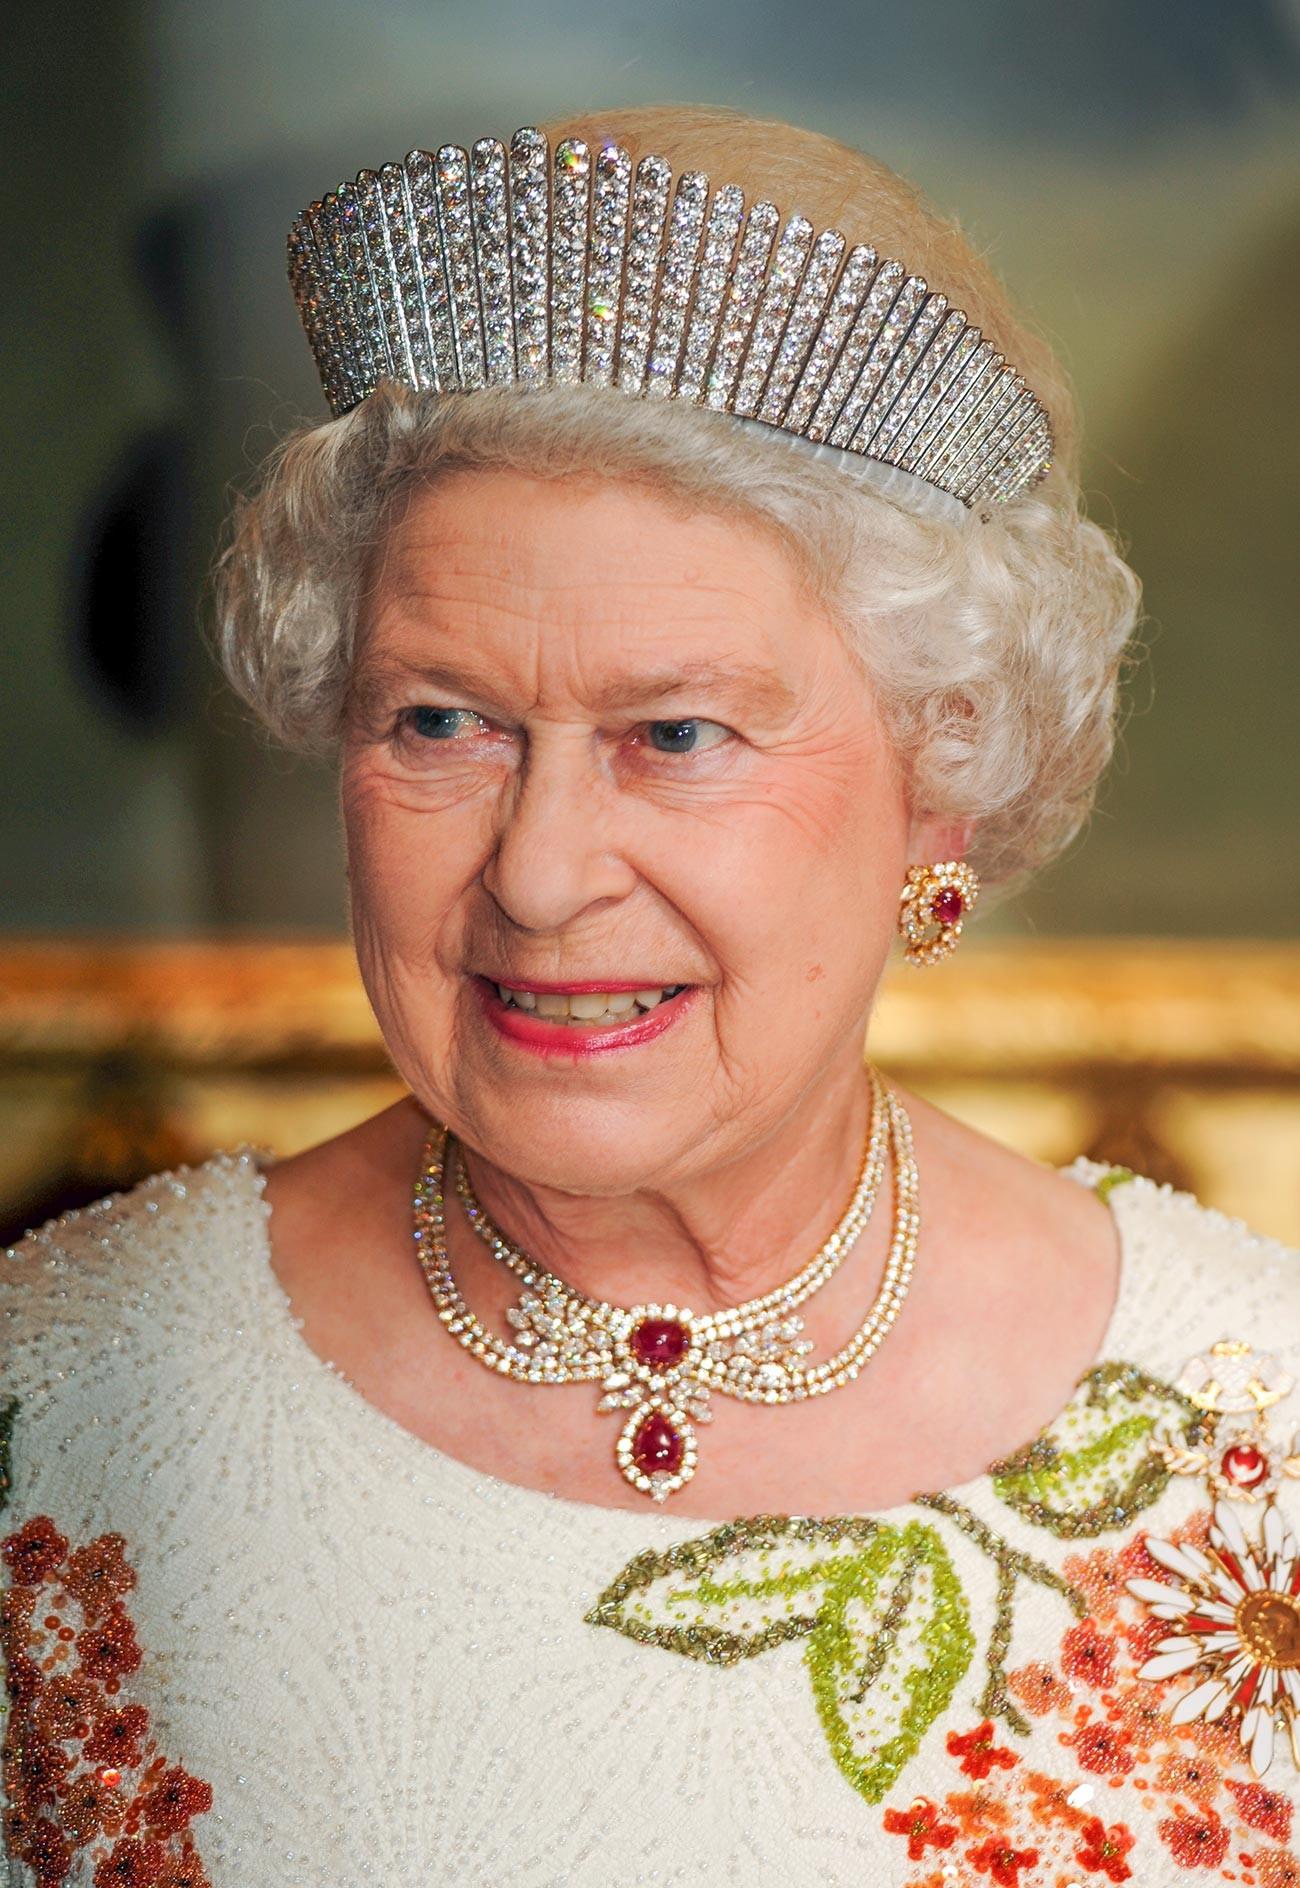 Краљица Елизабет II